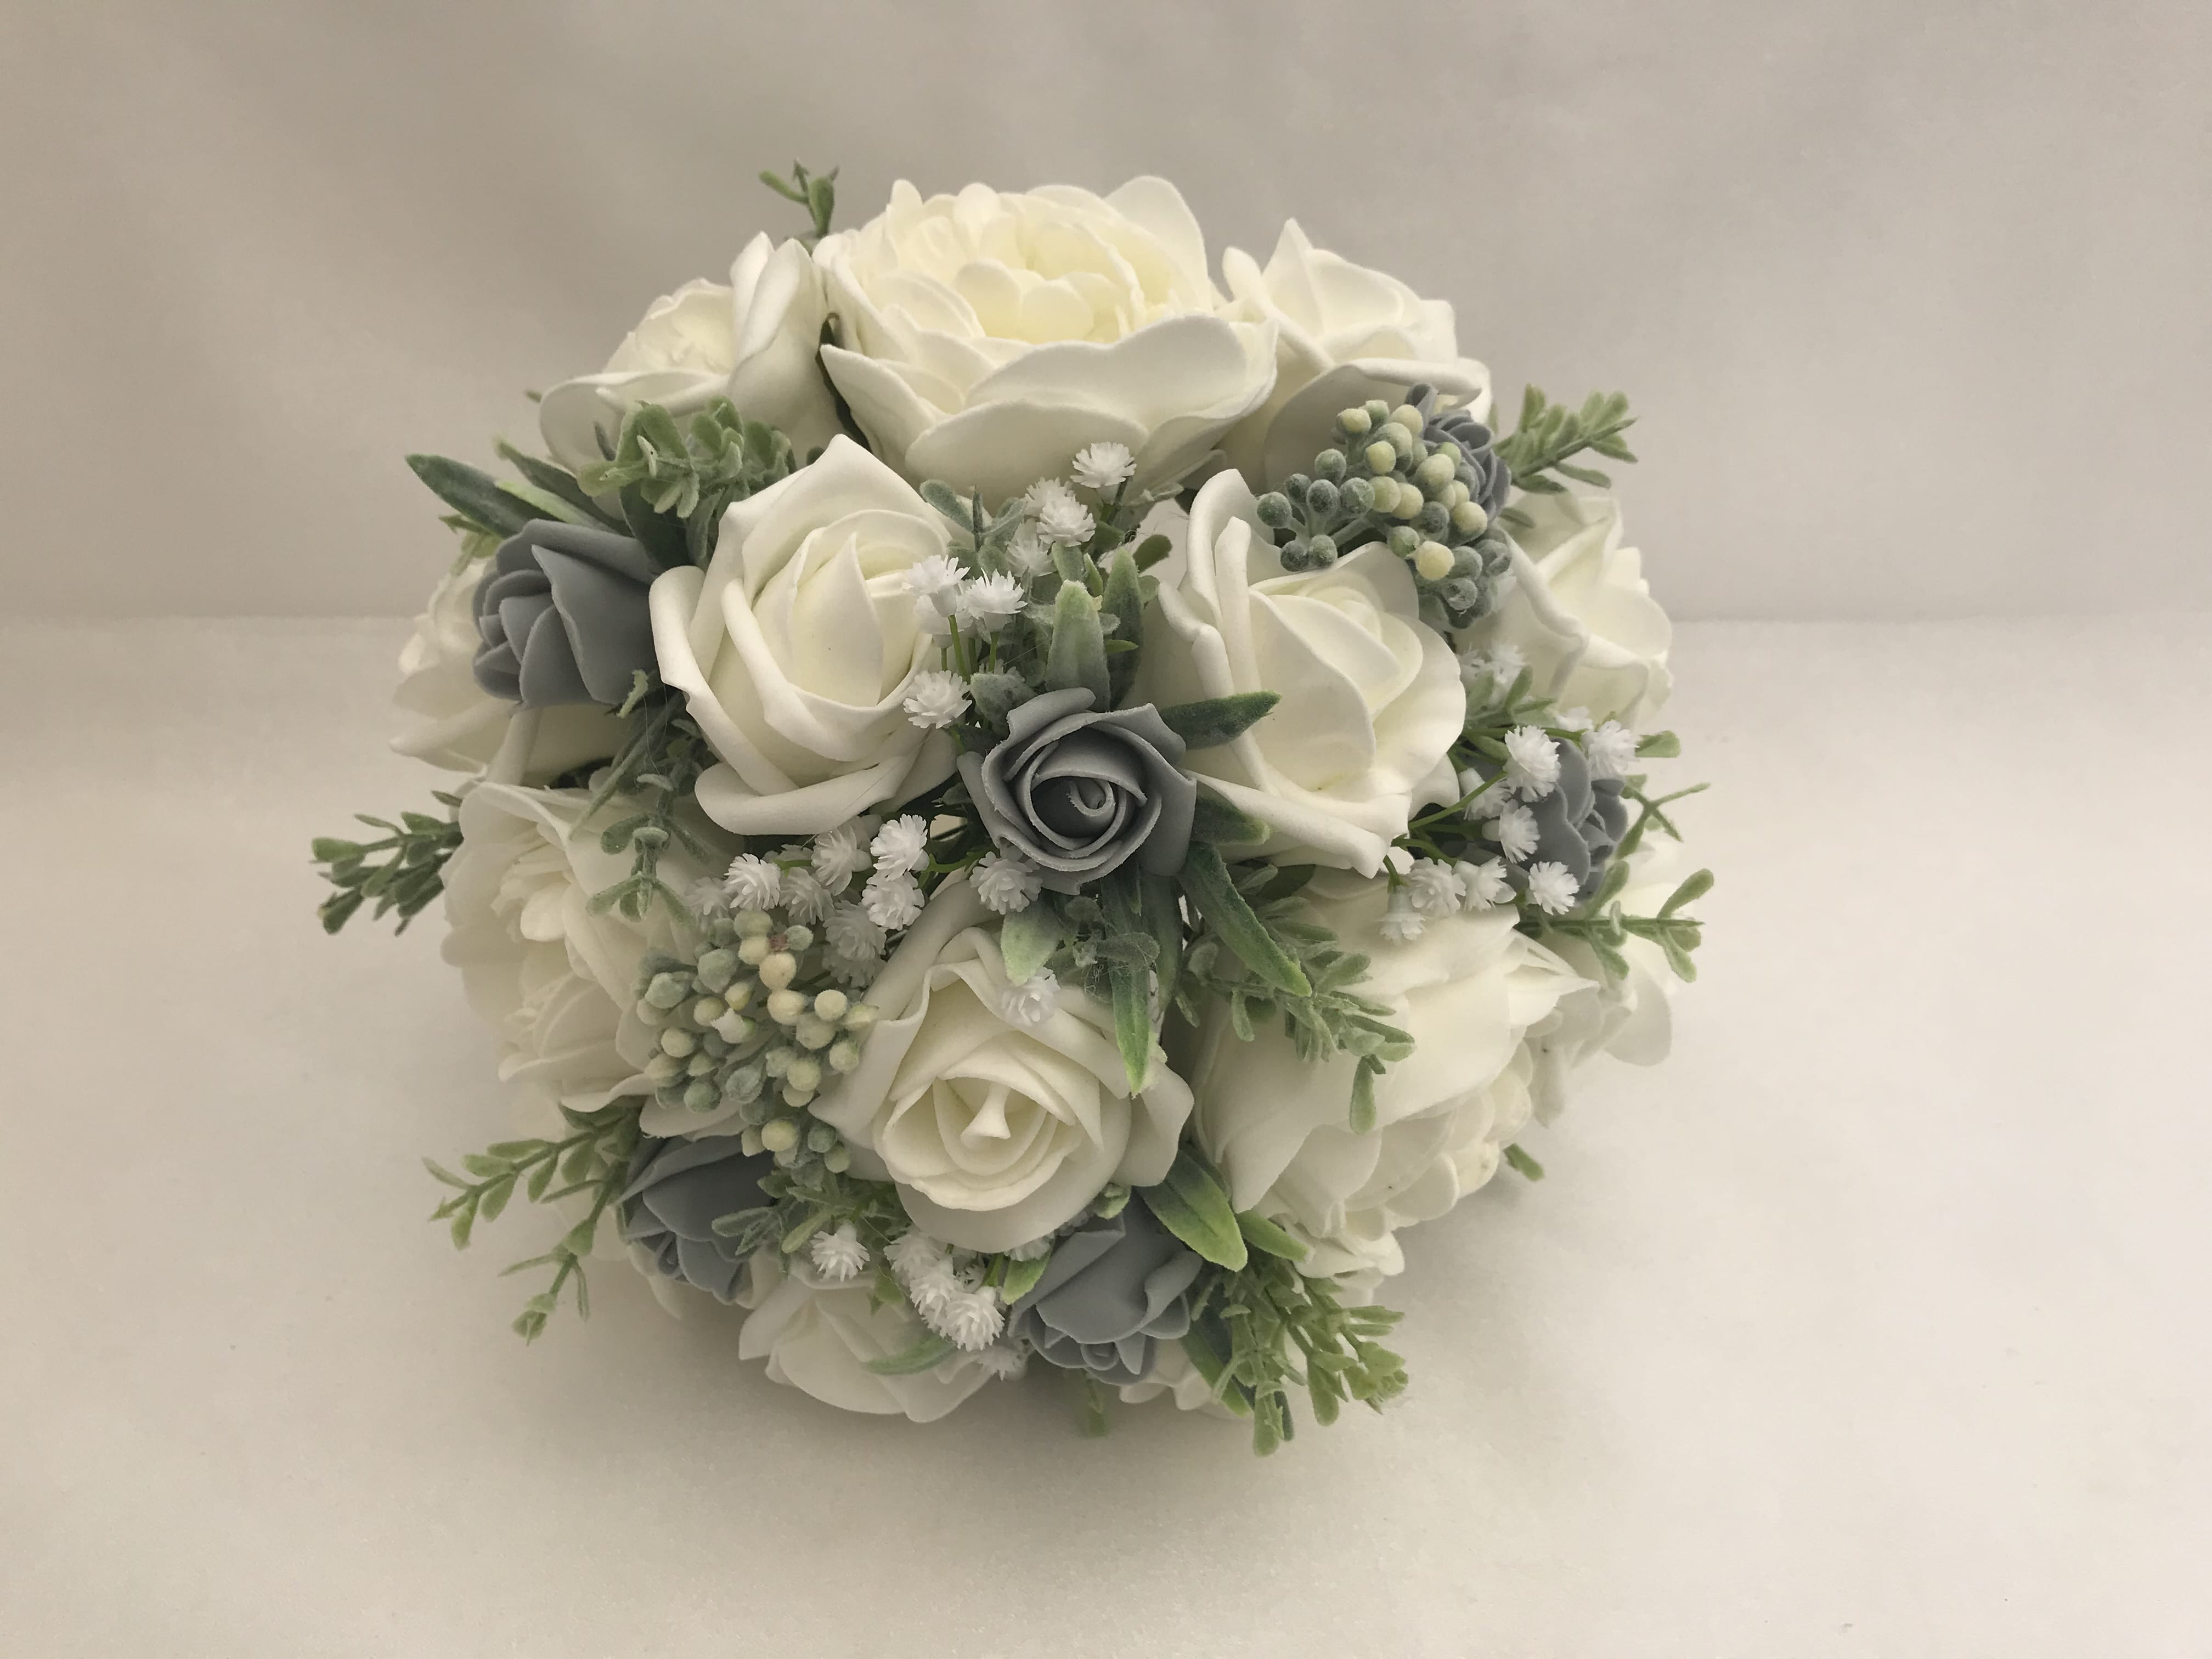 Artificial Brides Posy Bouquet Posy Peonies Berries